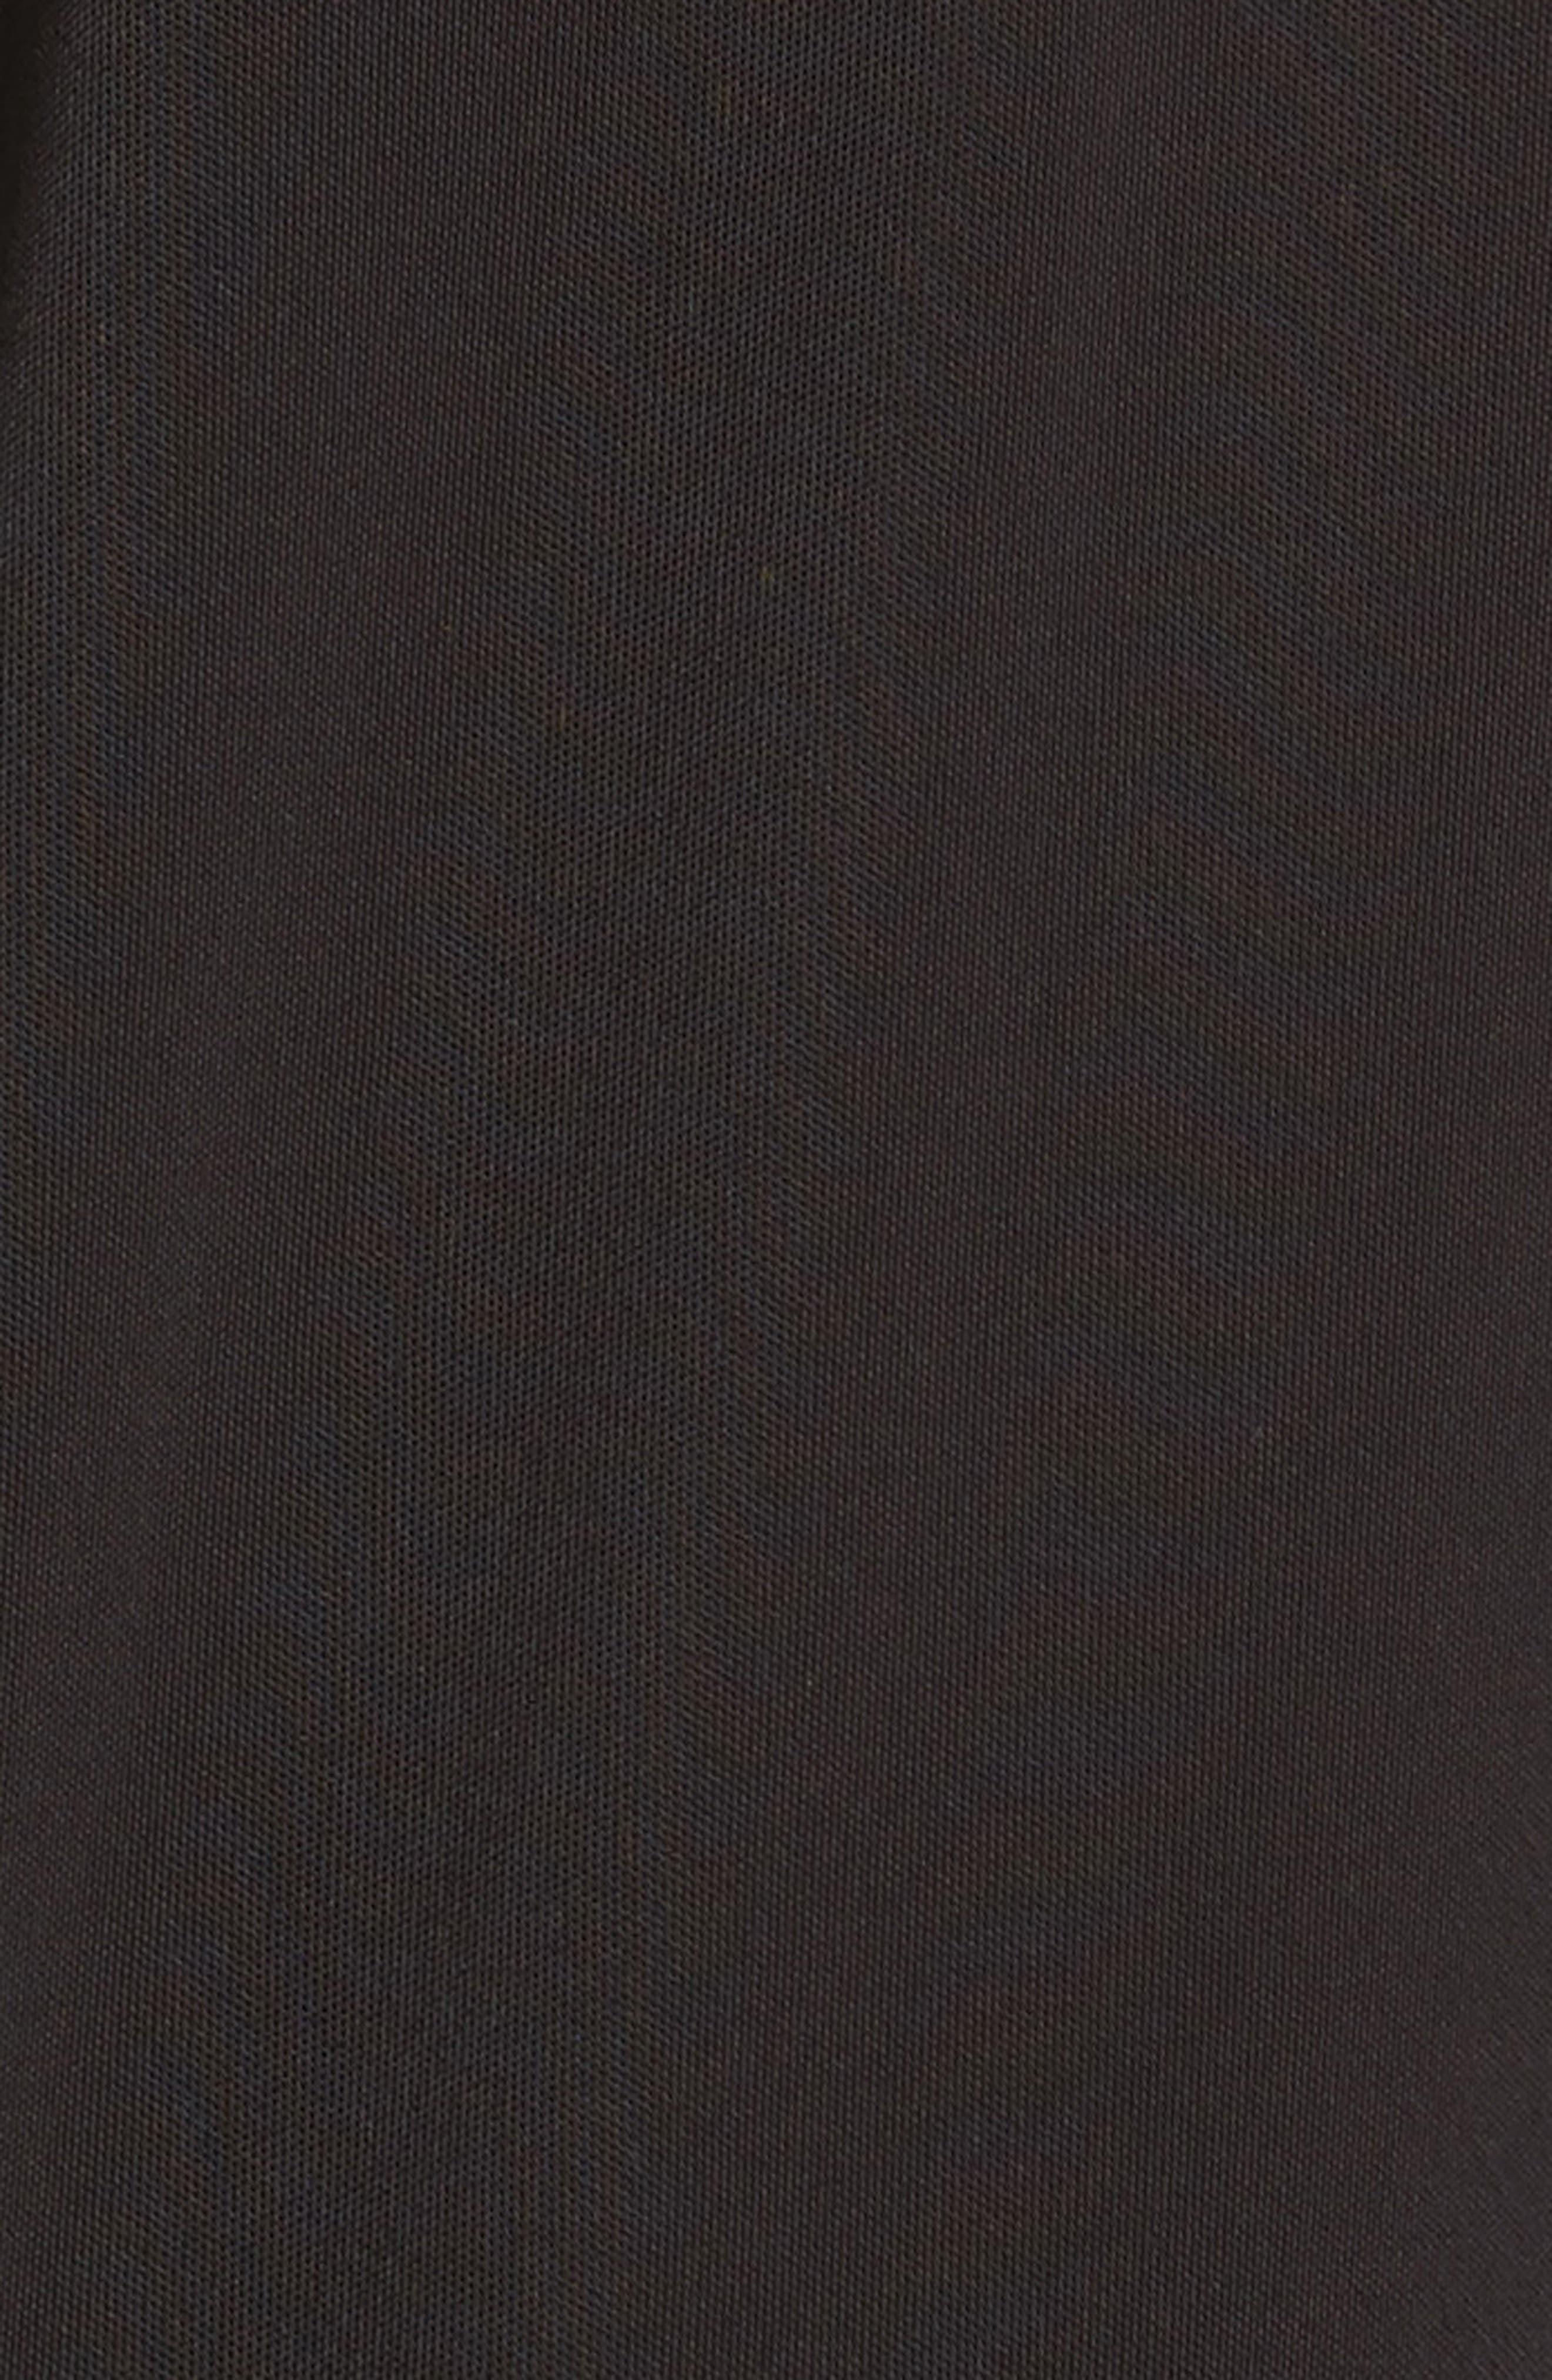 Merino Trim Turtleneck Sweater,                             Alternate thumbnail 5, color,                             Black